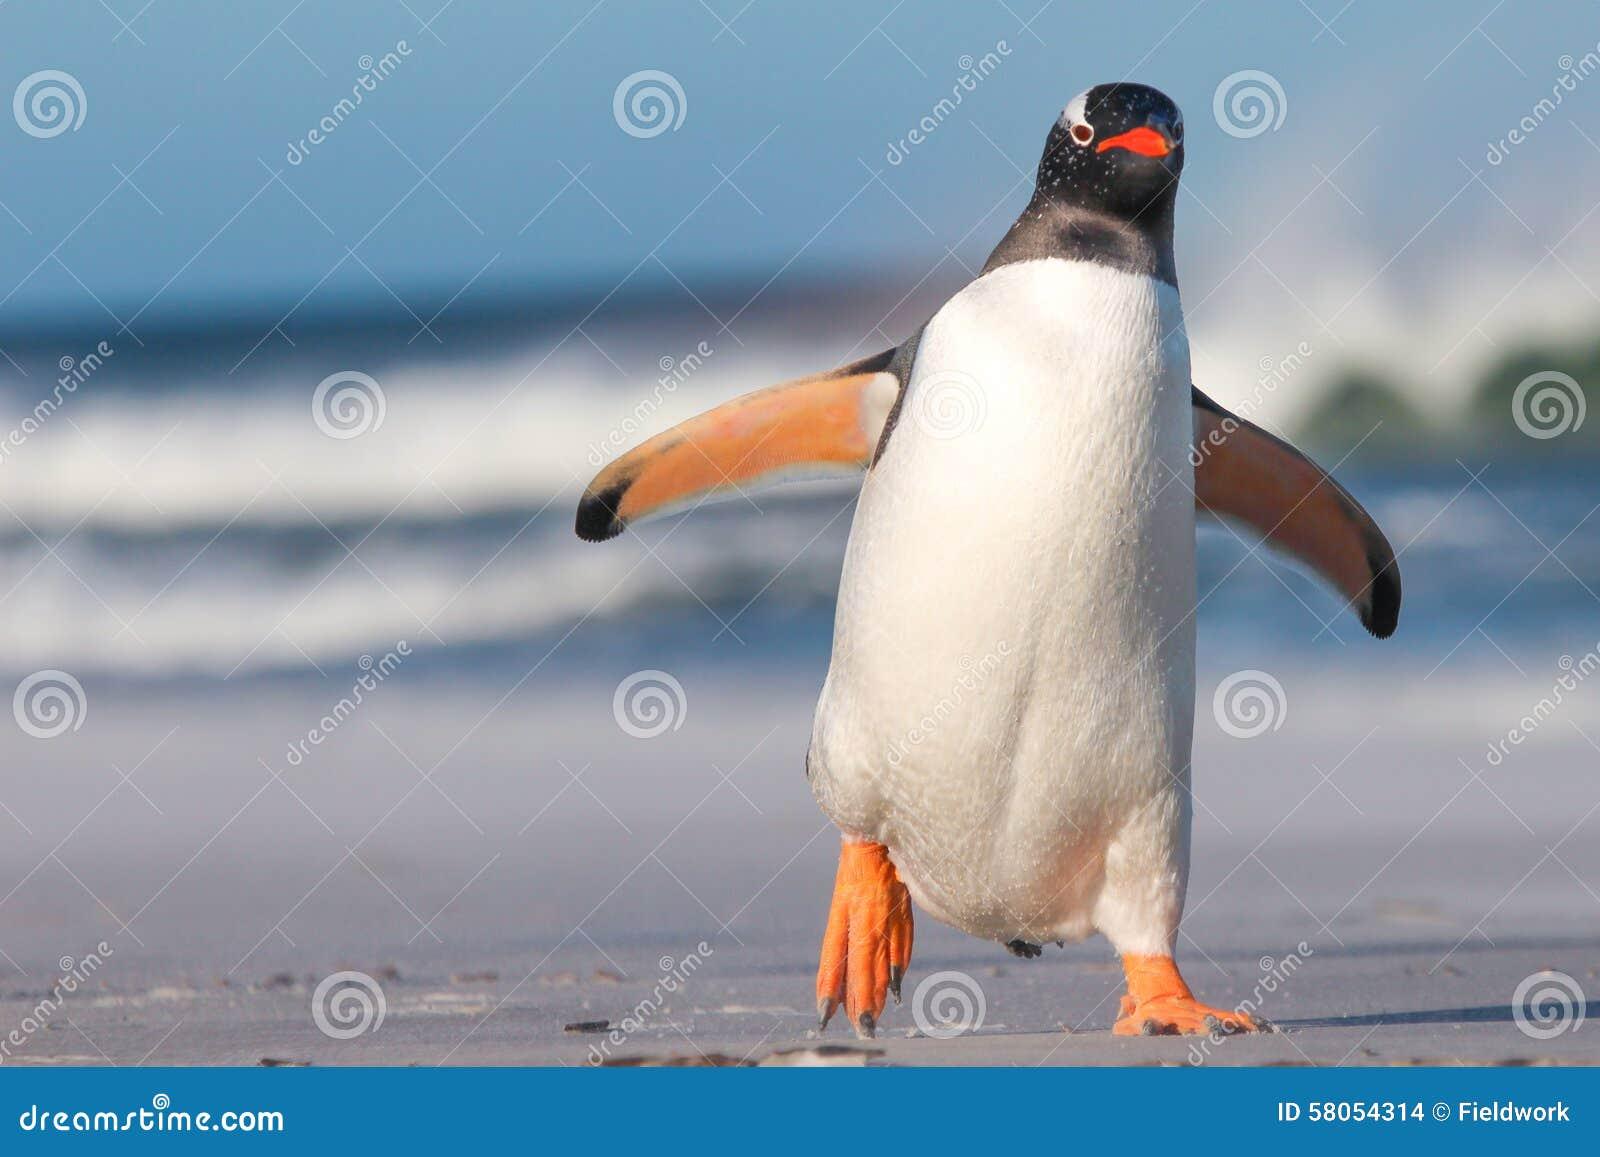 Gentoo Penguin (Pygoscelis papua) walking on the Beach.